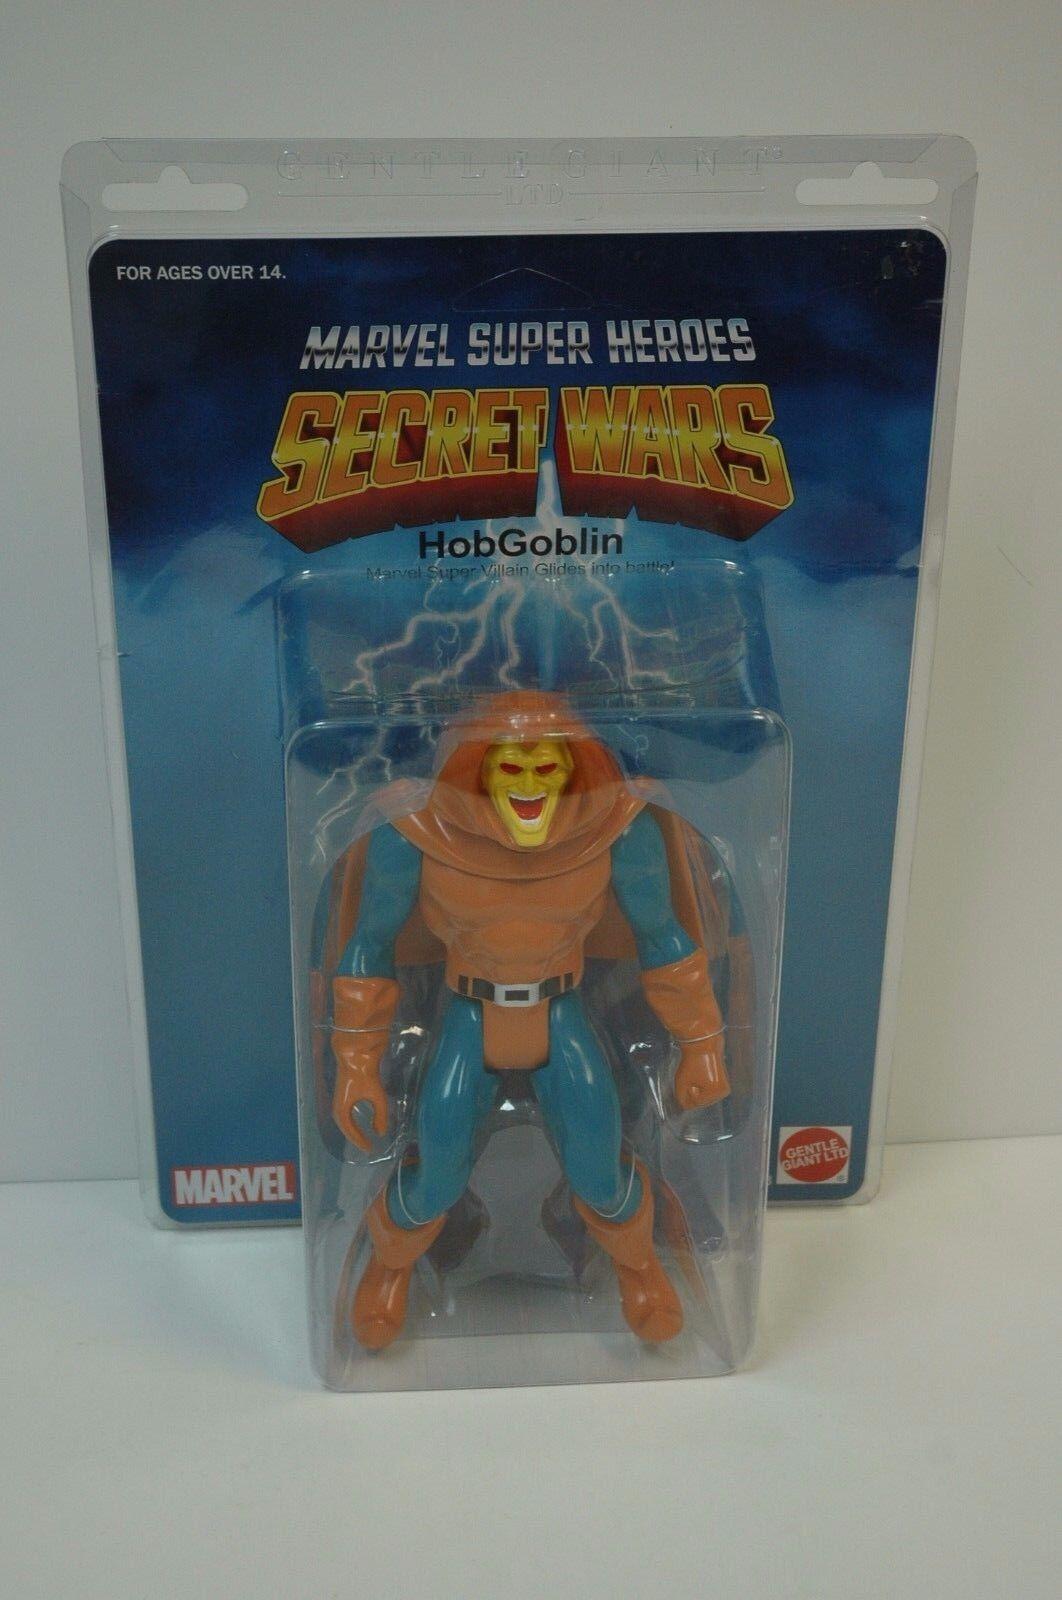 Marvel HOBGOBLIN Marvel Super Heroes Secret Wars MOC Gentle Giants LTD 12